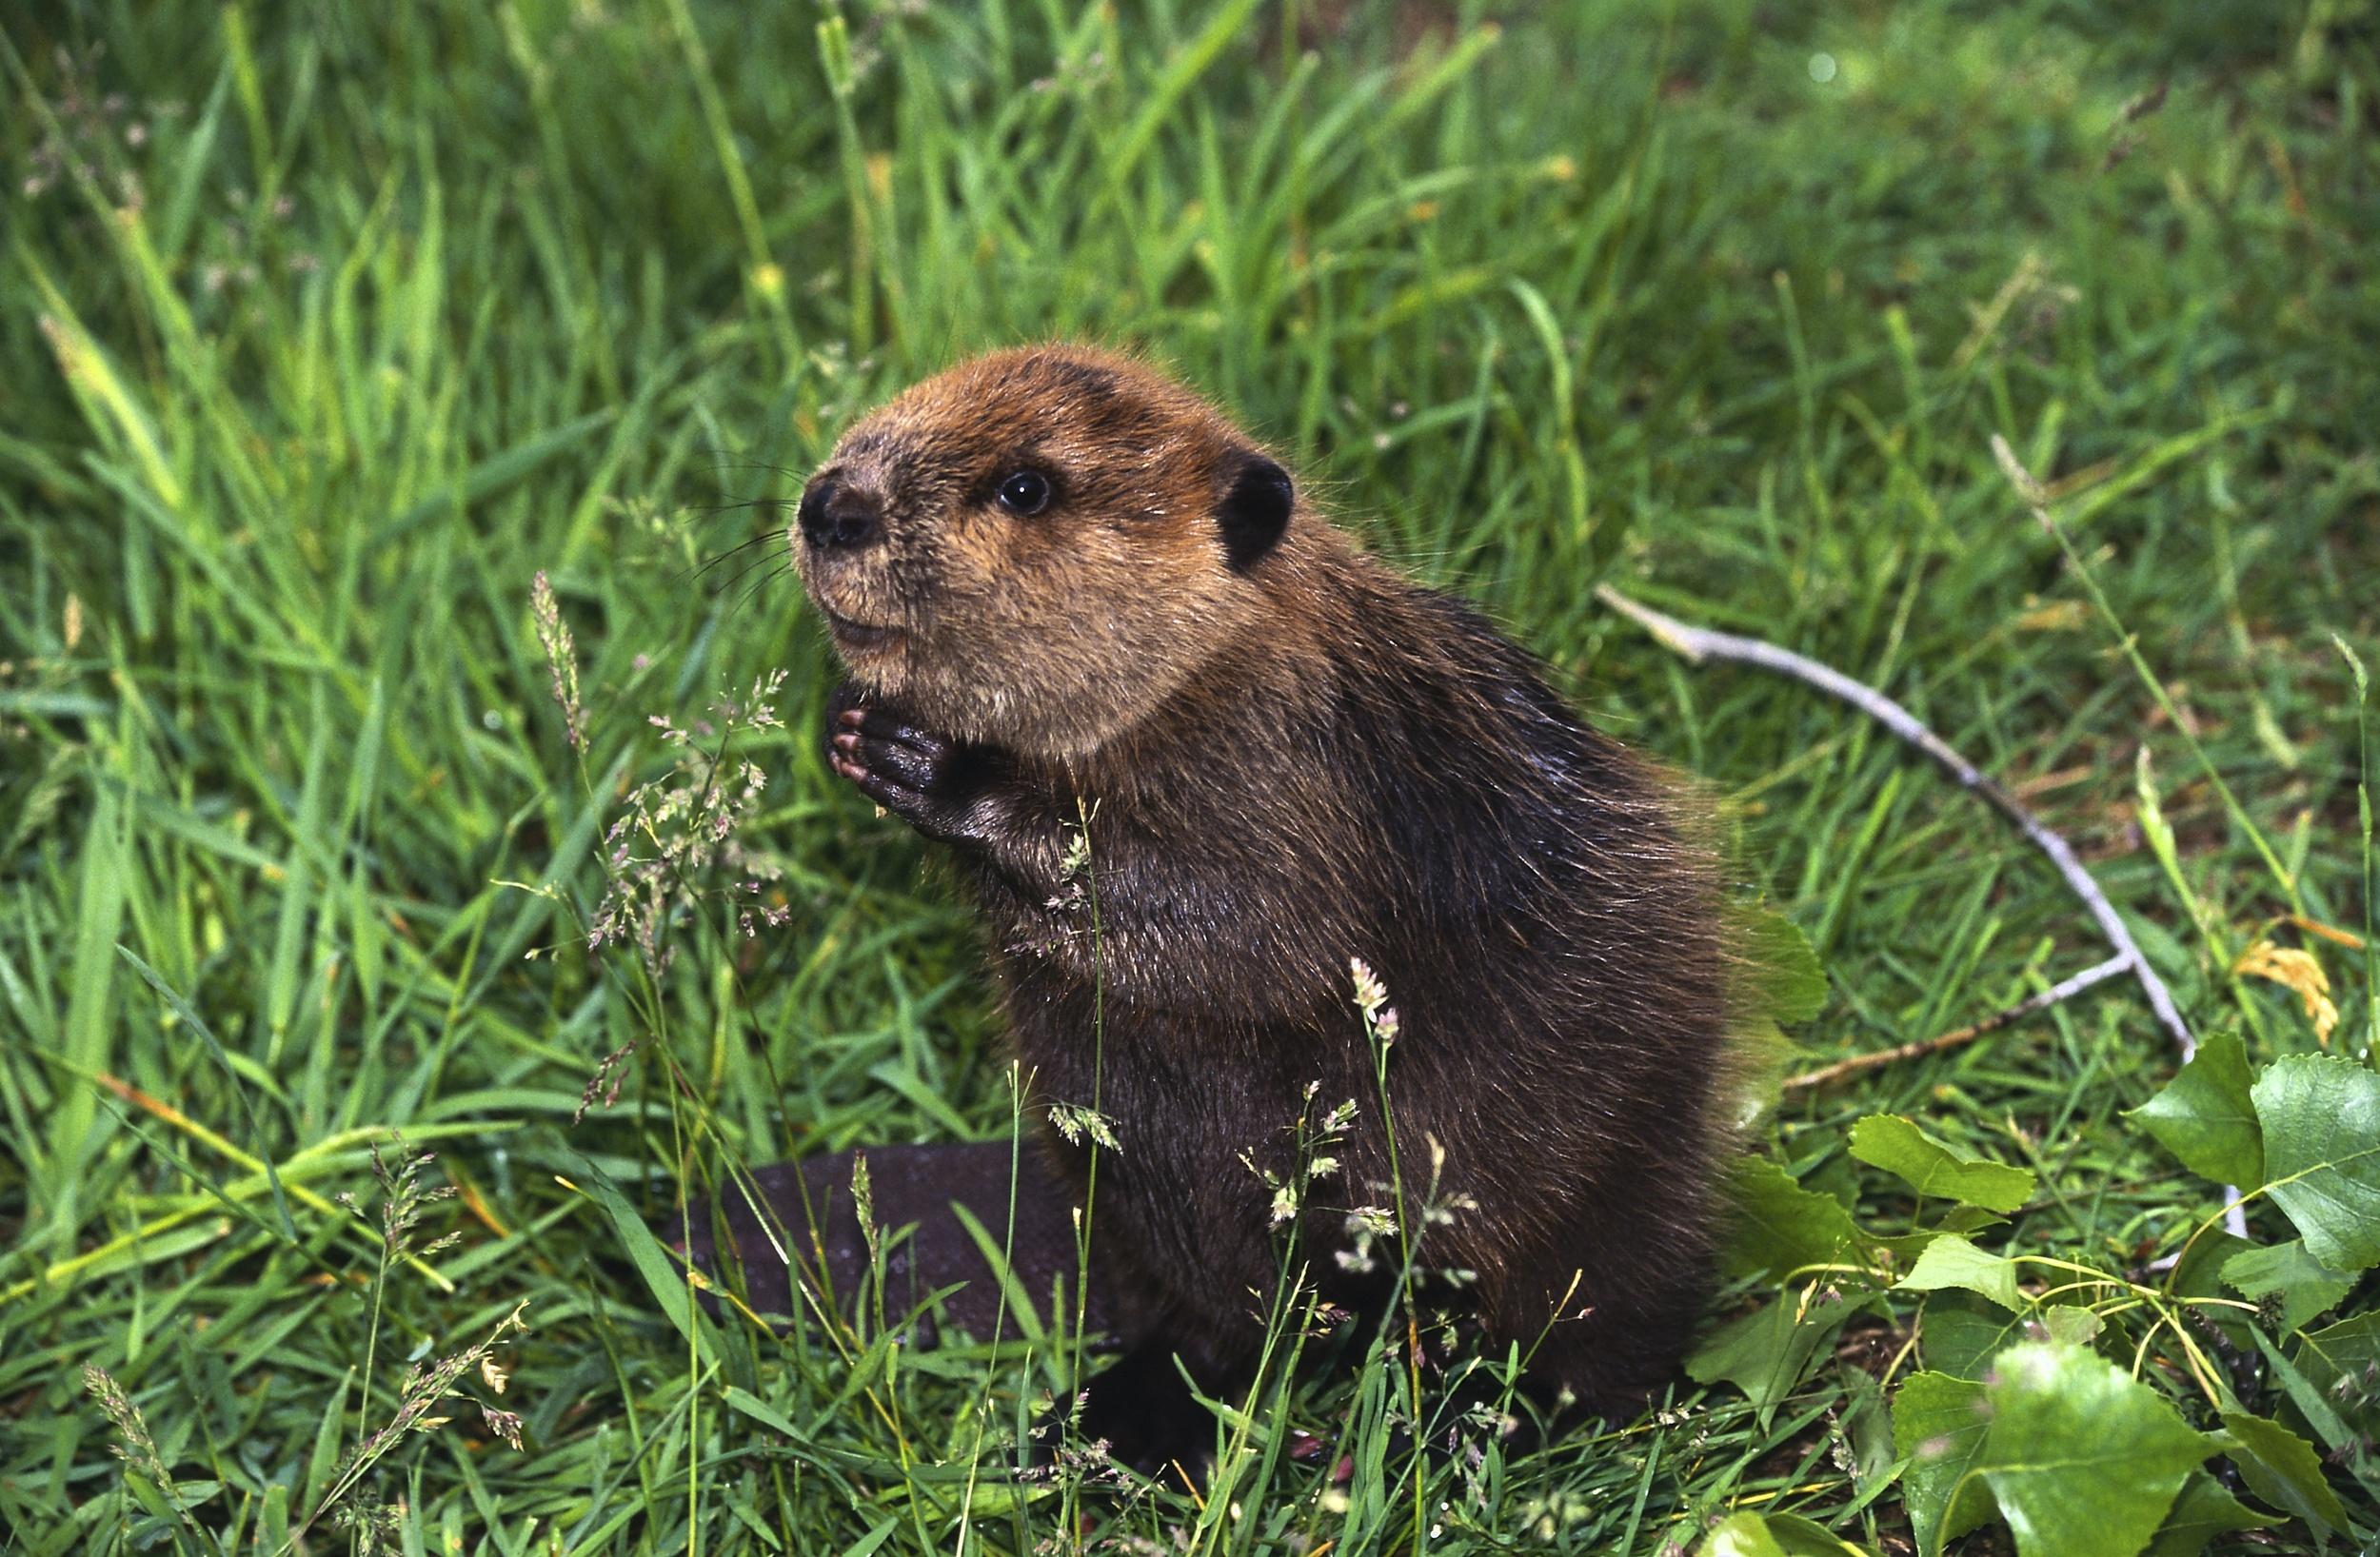 Above: Adorable internet beaver